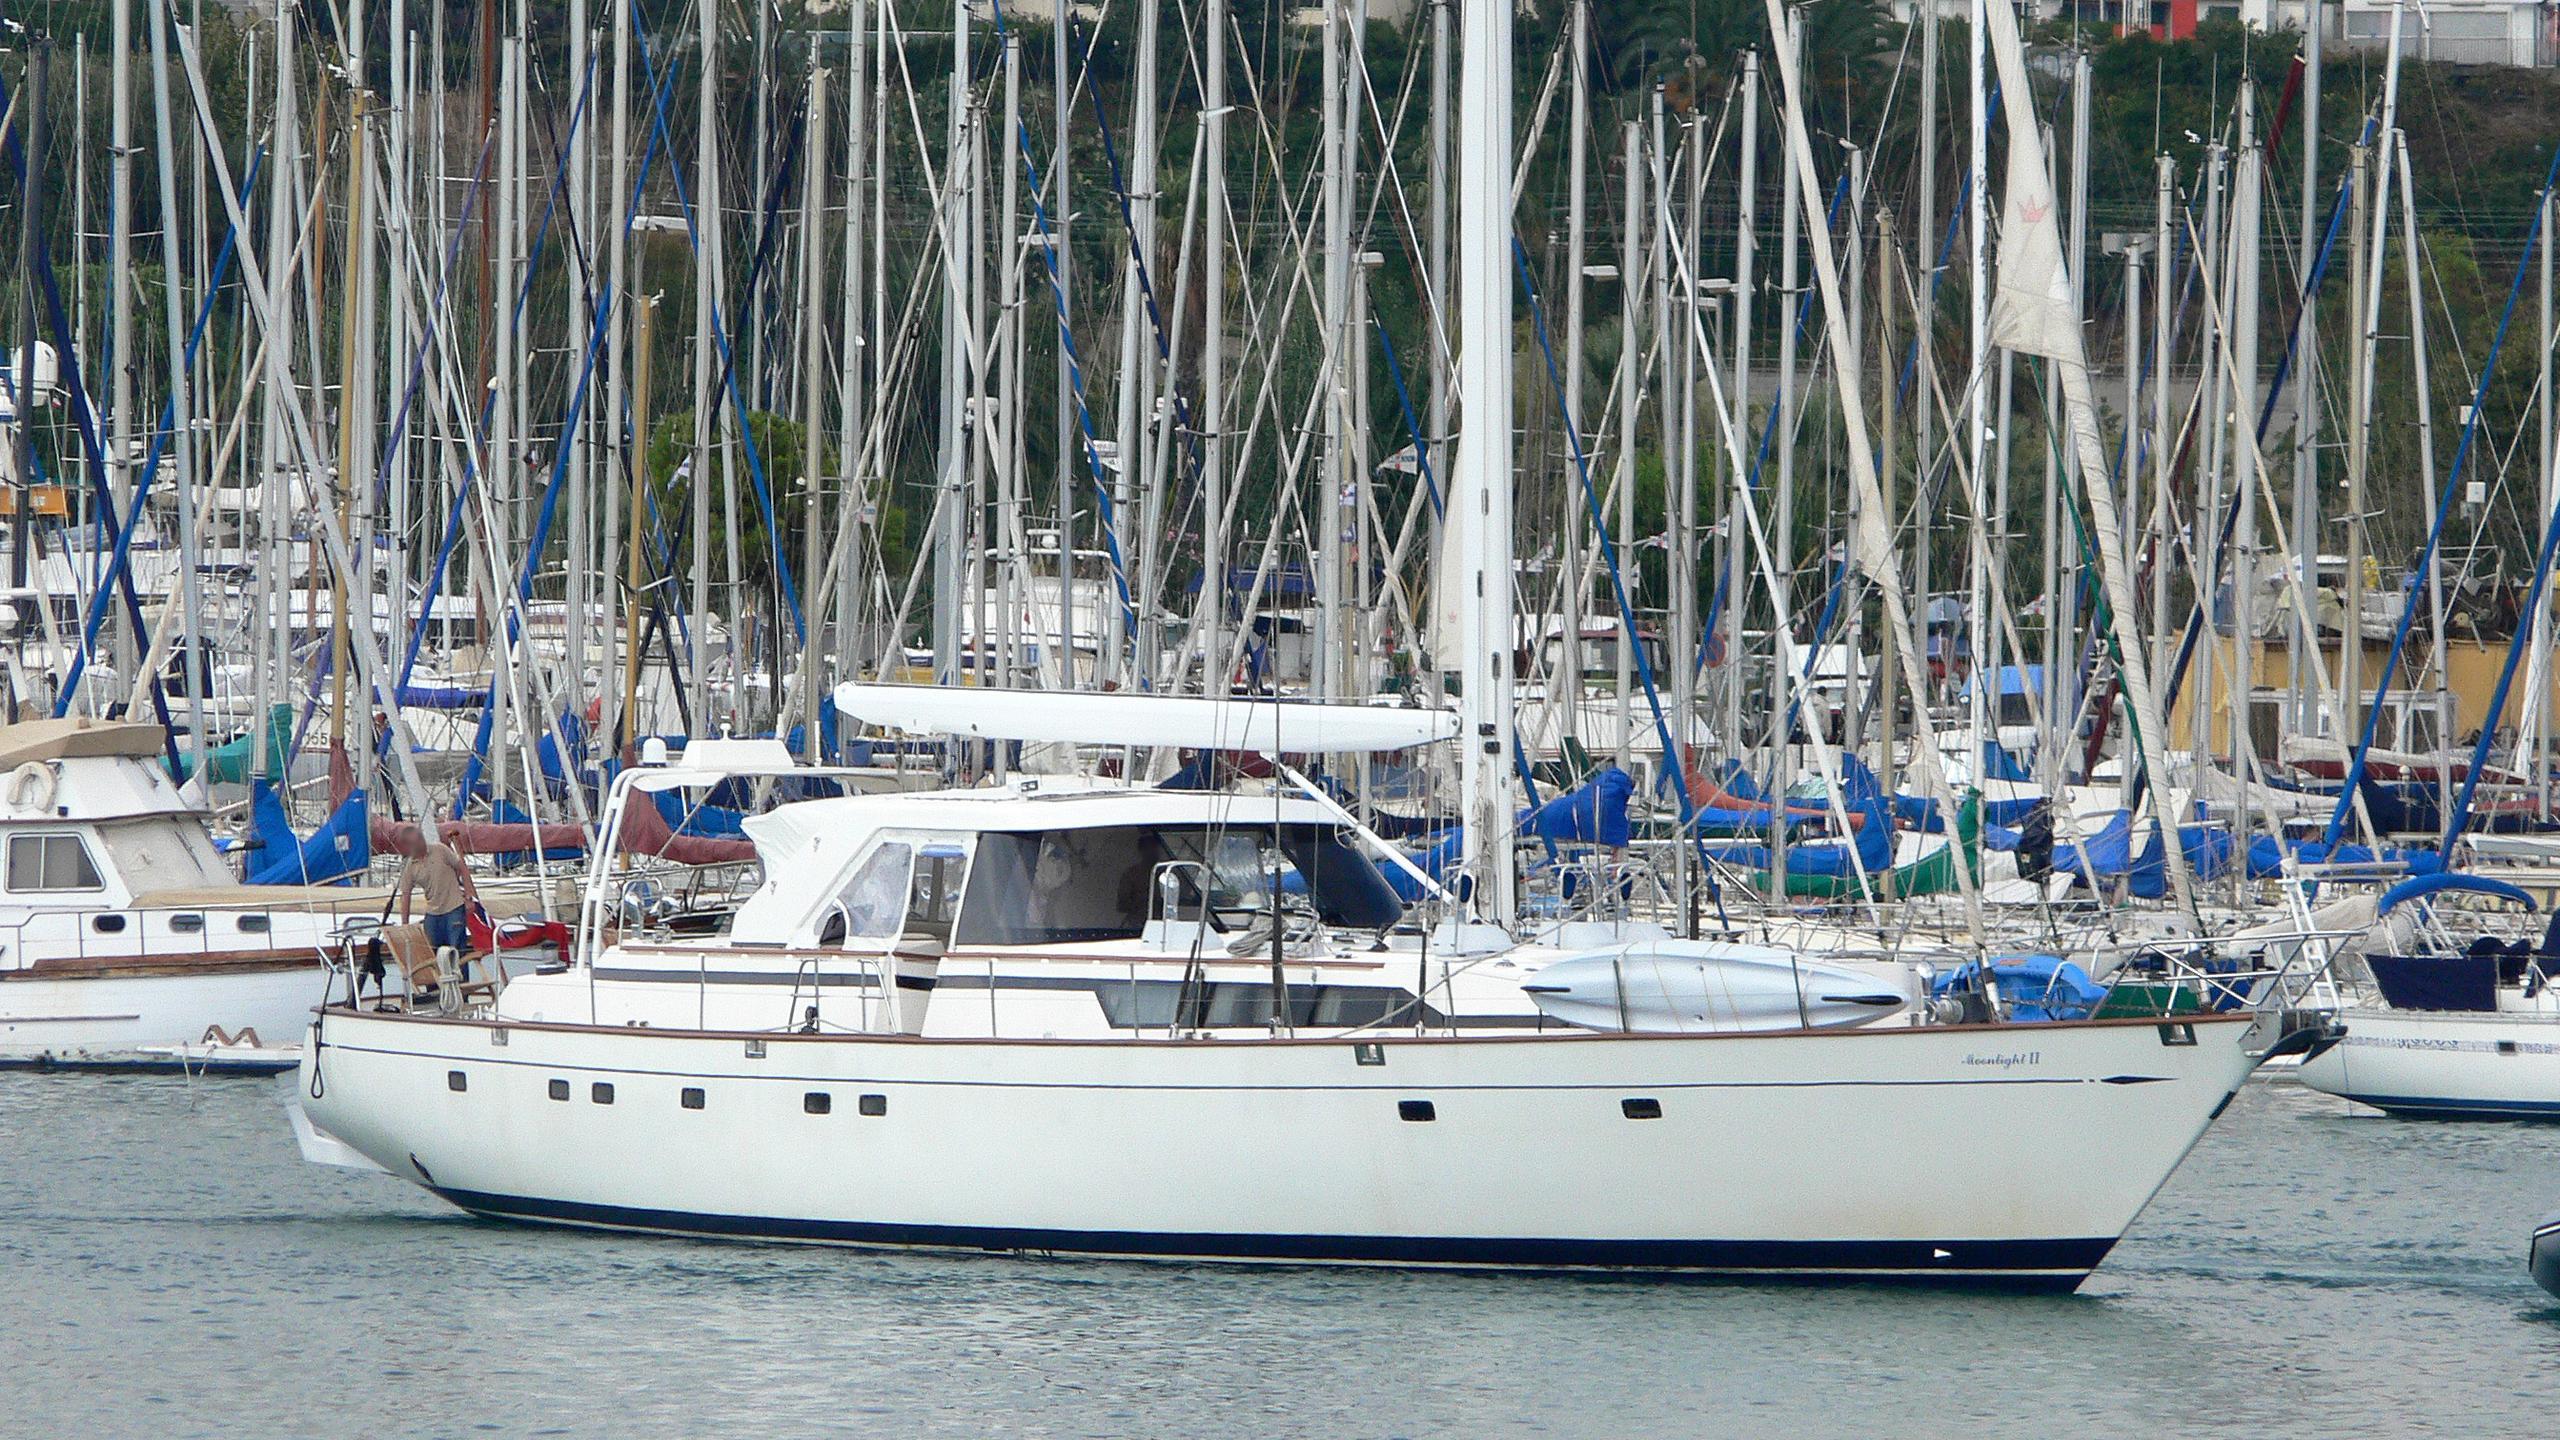 moonlight-ii-sailing-yacht-cim-1992-30m-half-profile